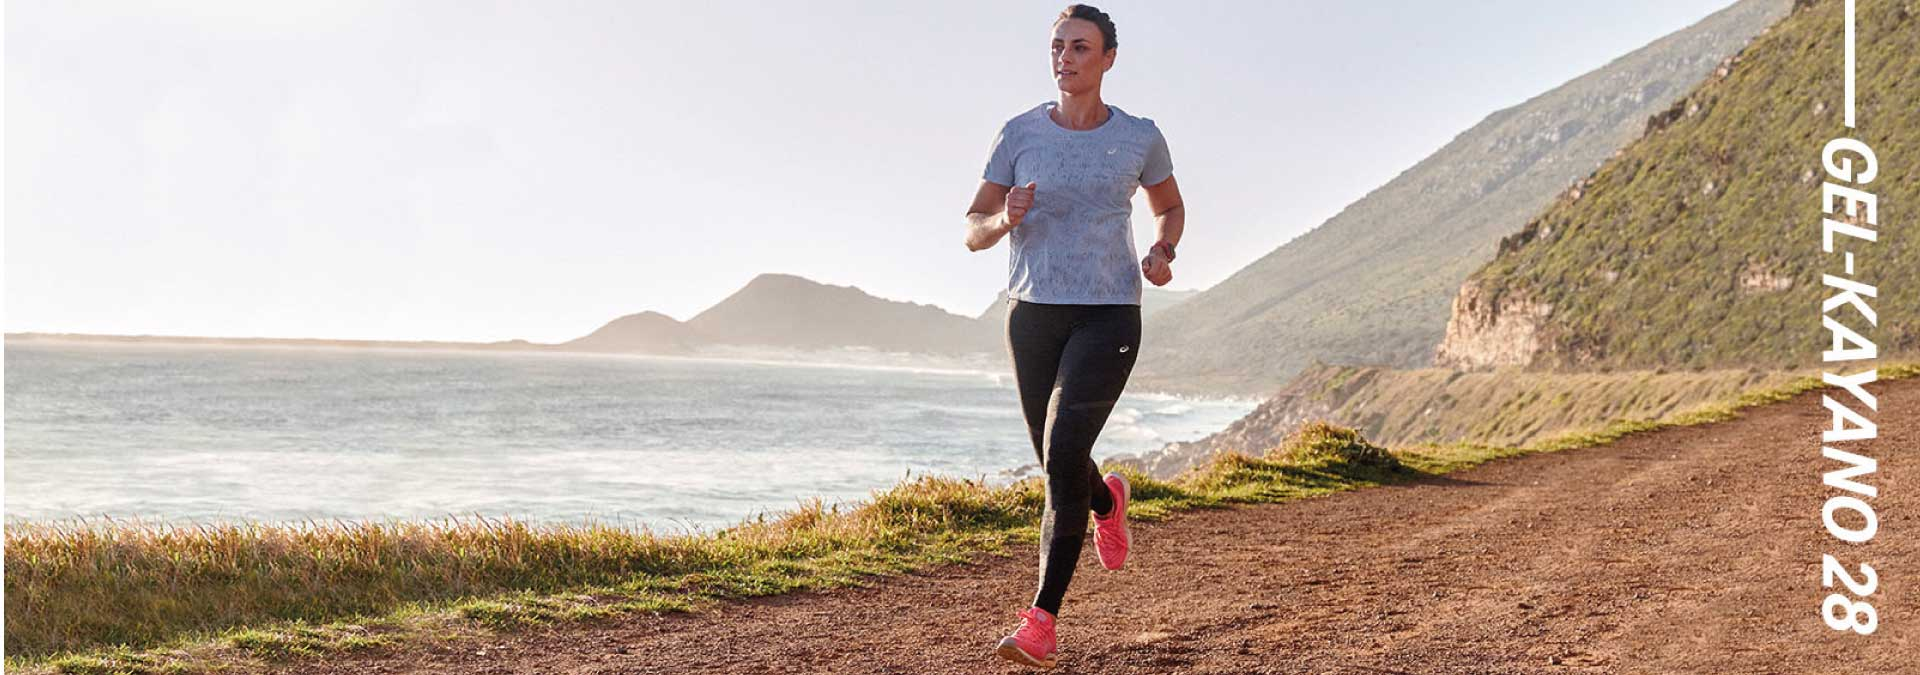 running asics gel kayano 28 donna